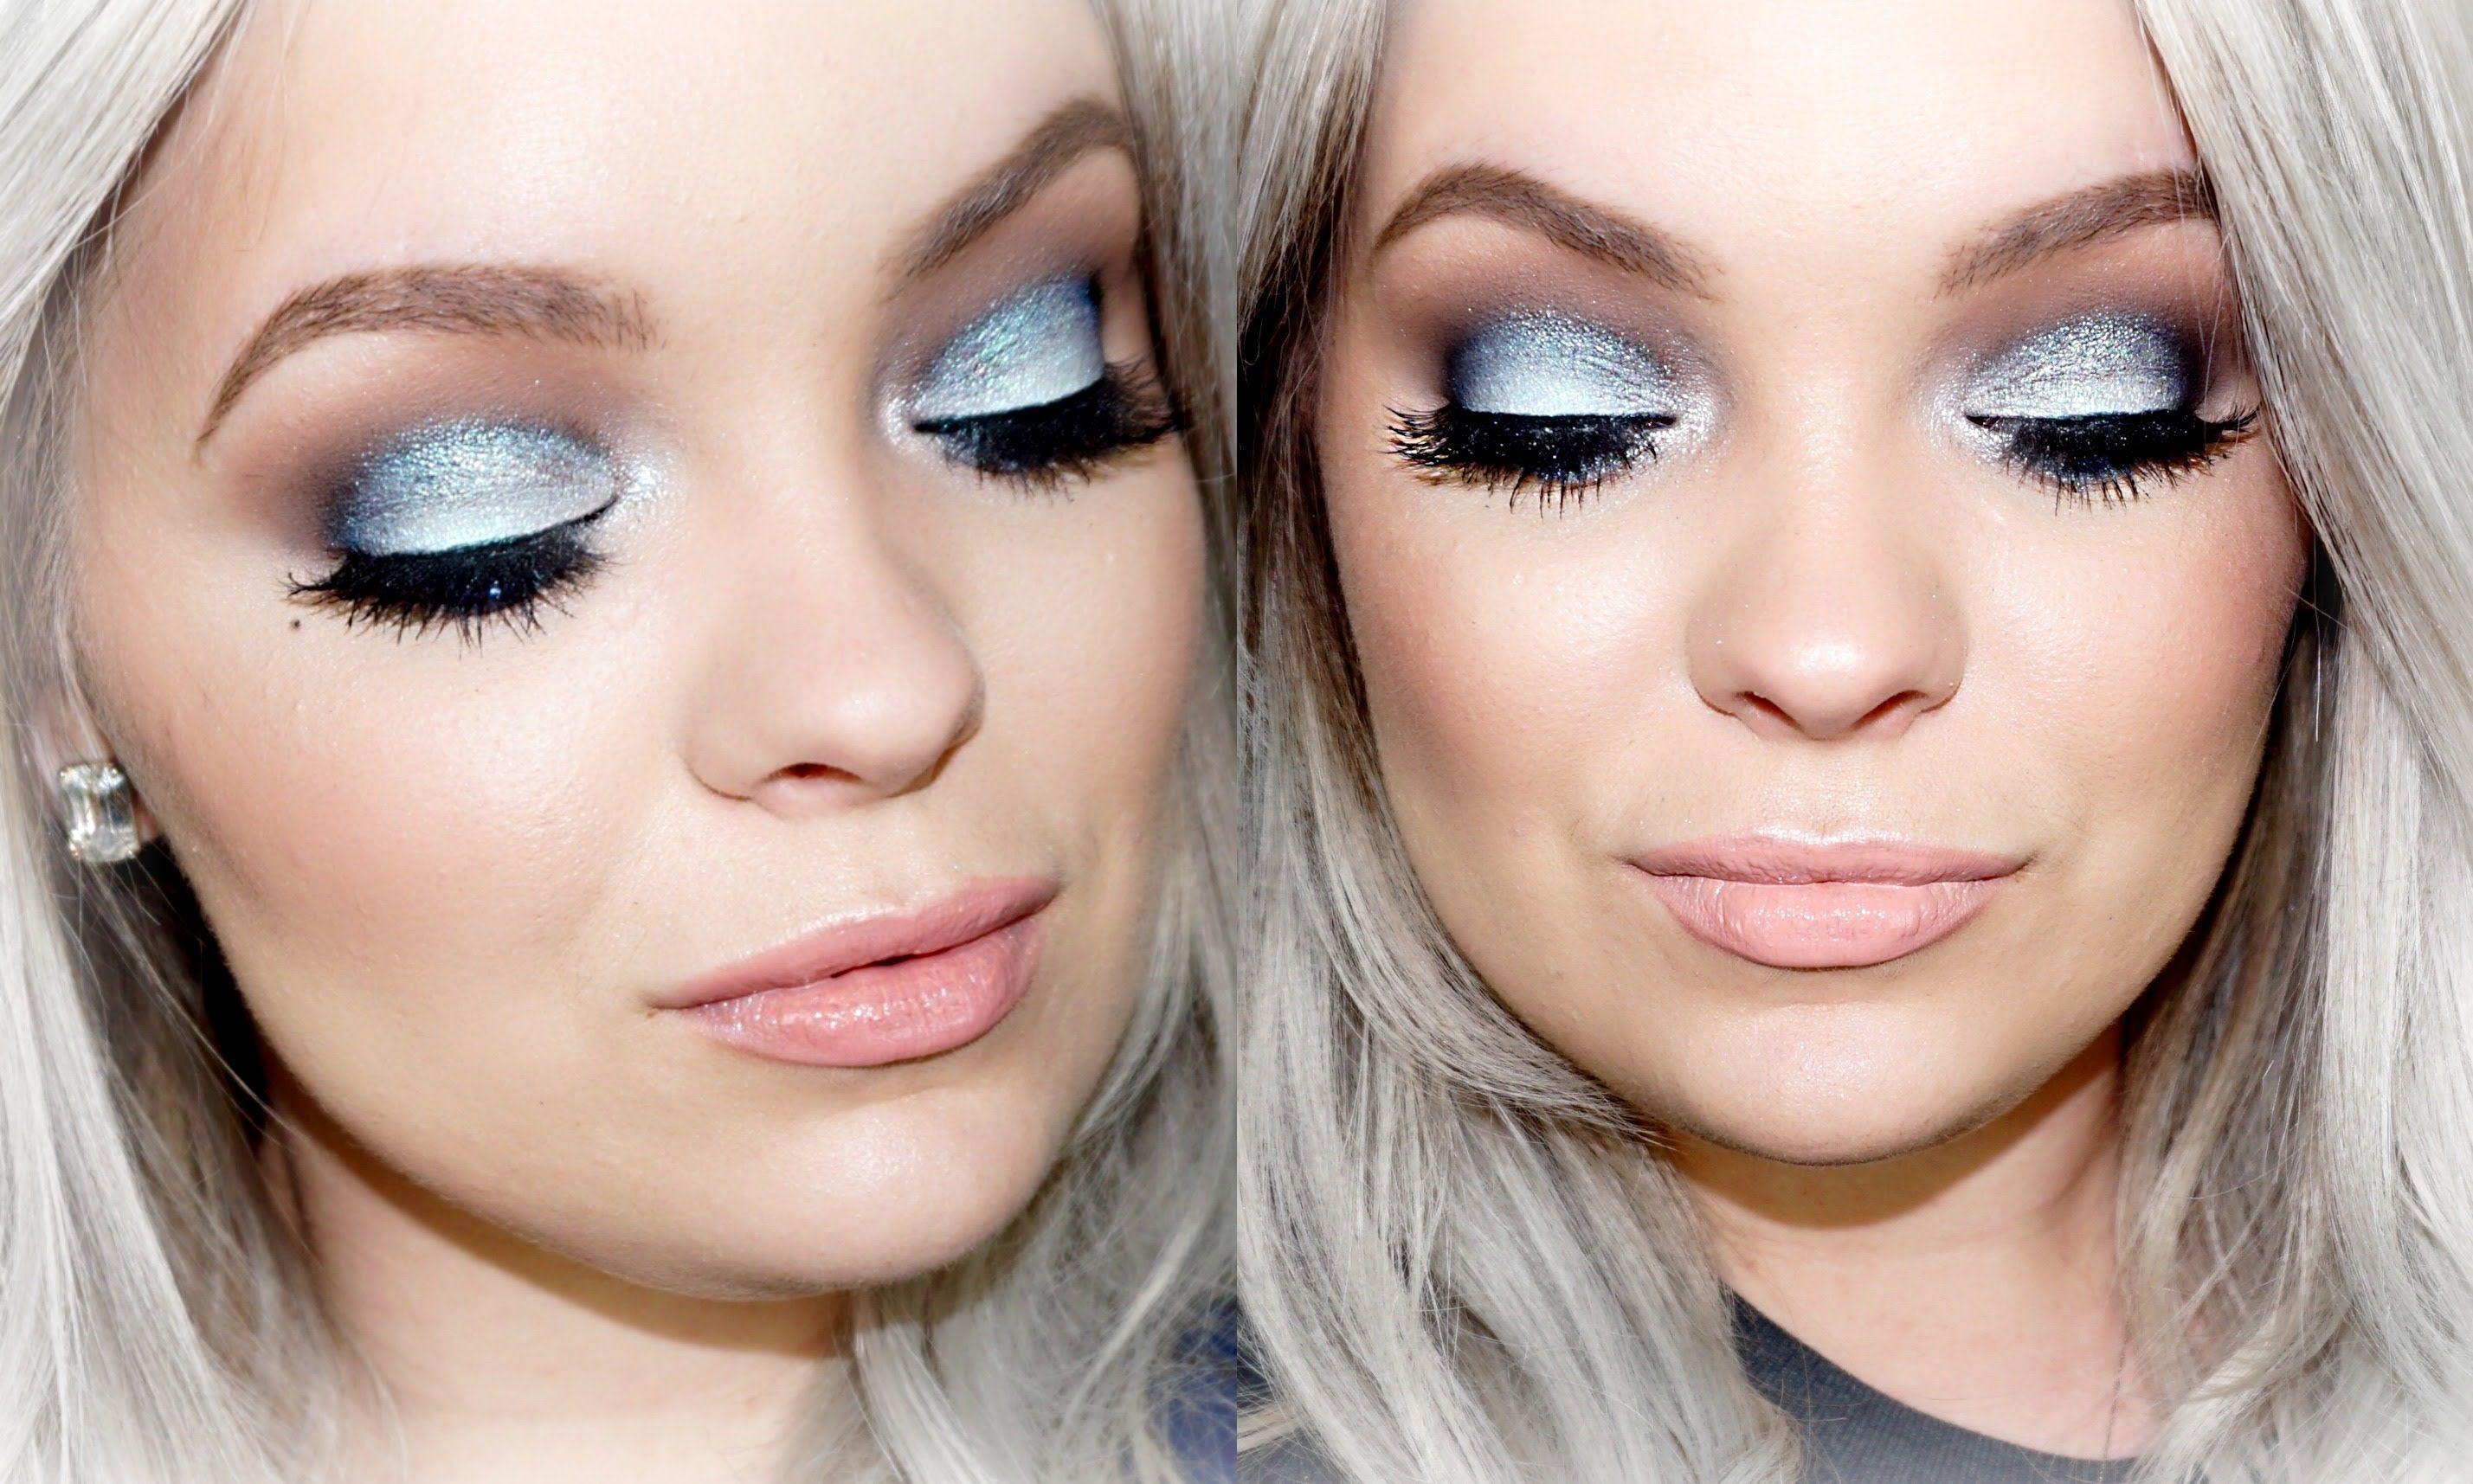 Icy Blue Smokey Eyes Makeup Tutorial Brianna Fox (With